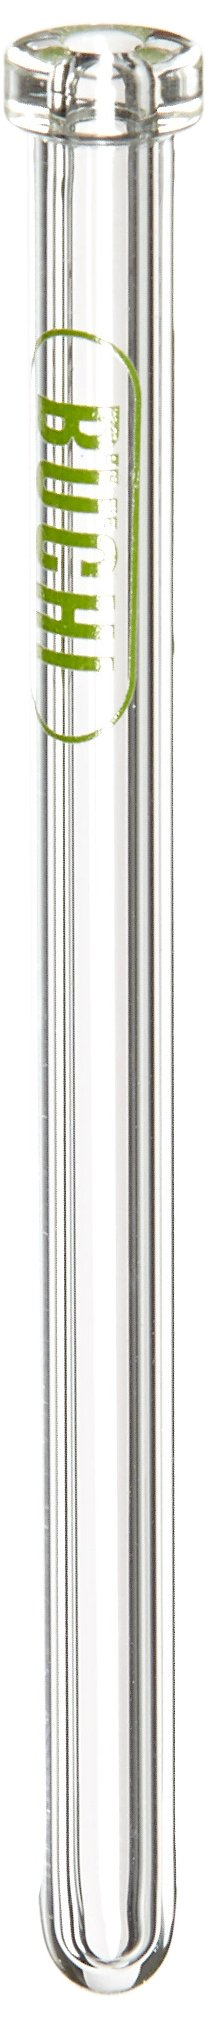 Buchi 018921 Glass-Tube F. Probe, 86mm Length by Buchi (Image #1)